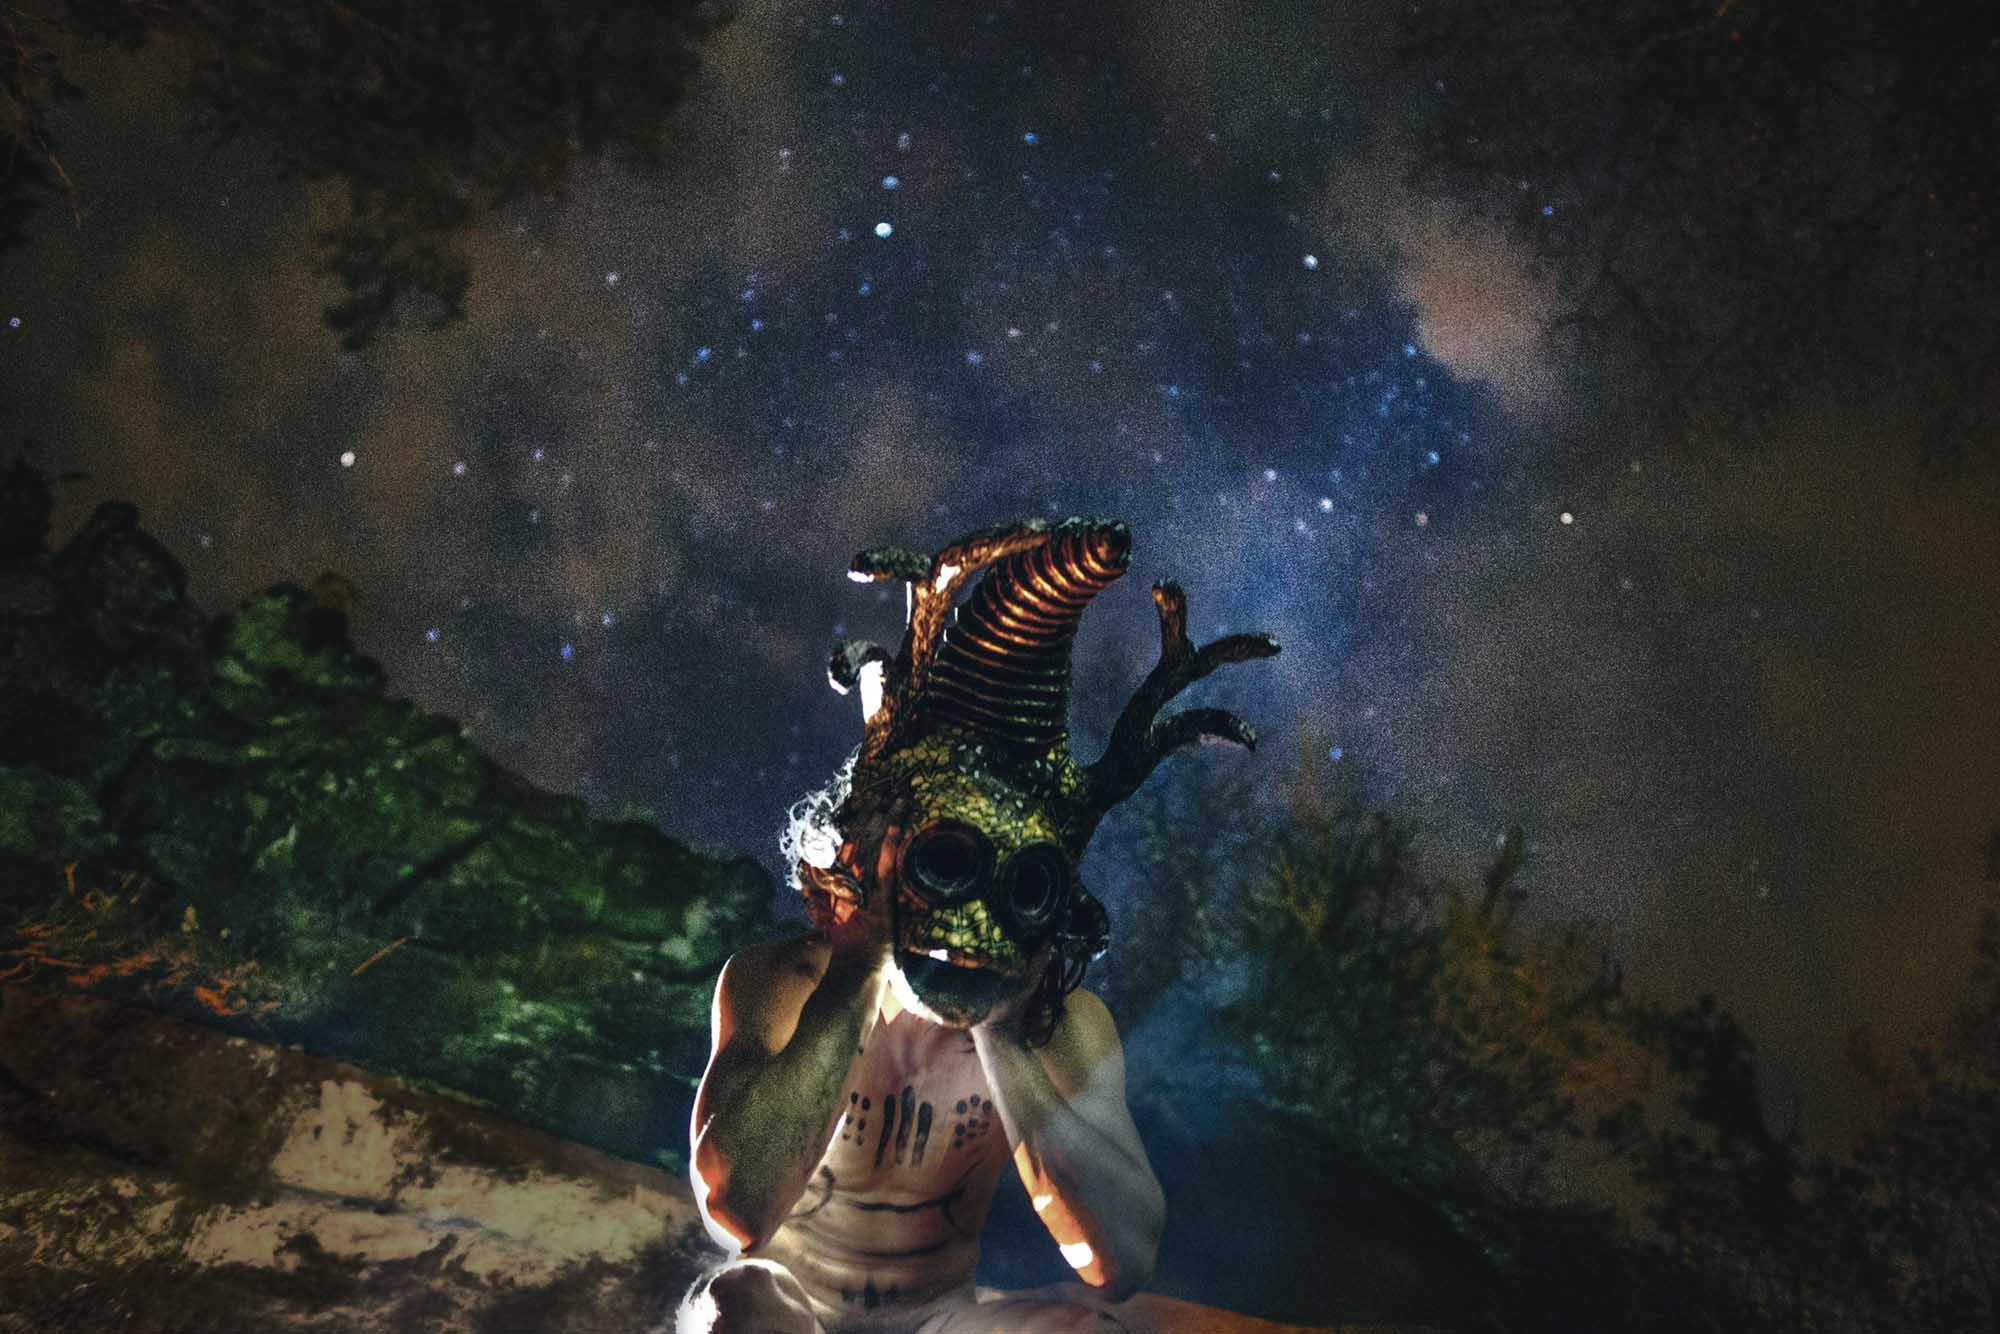 Leonard Condemine - masked figure under night sky